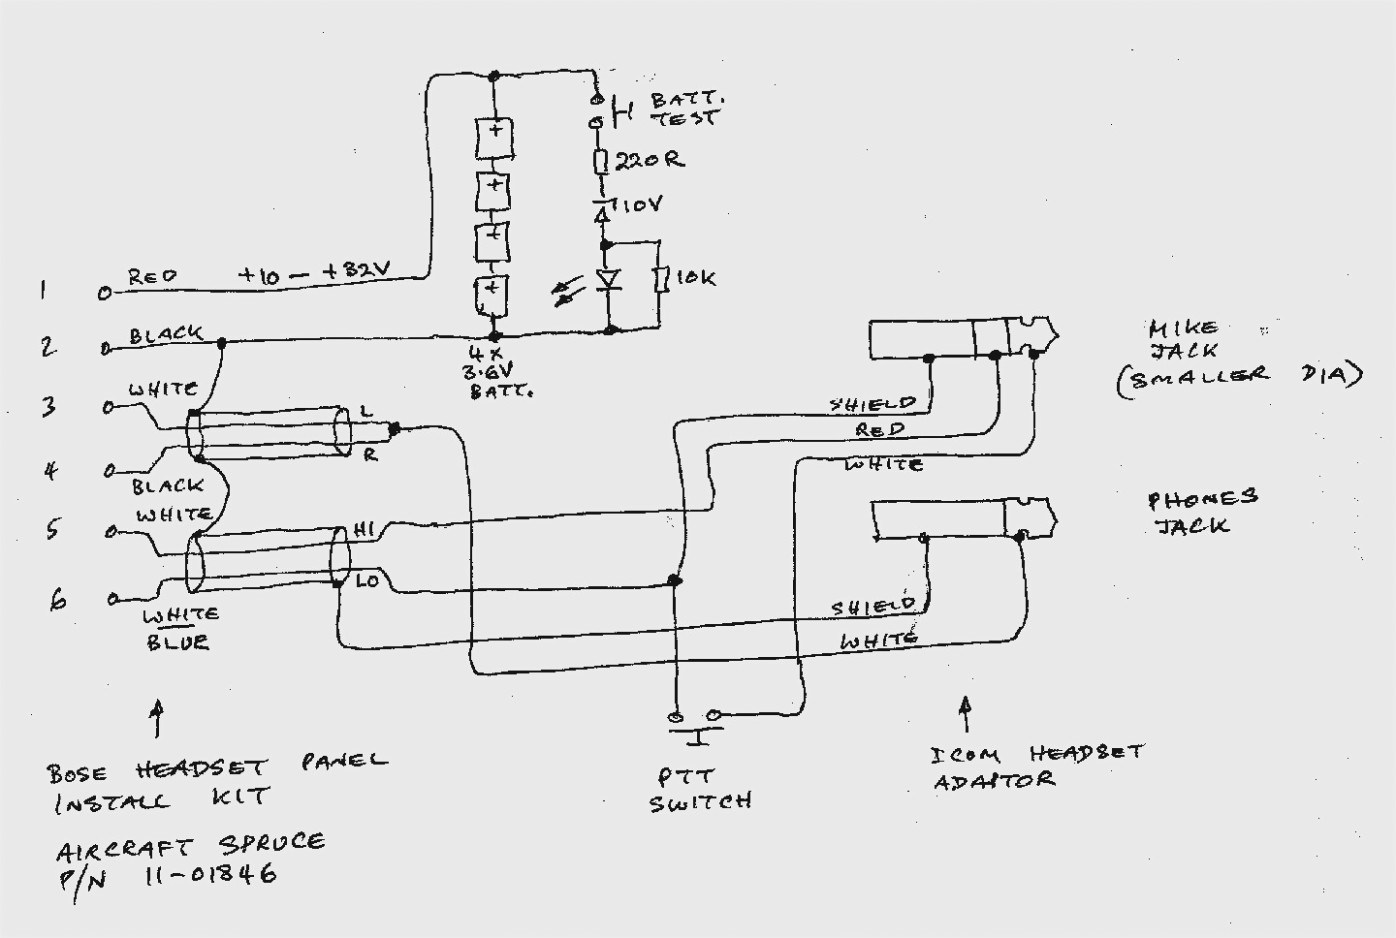 Clark Gcx30e Wiring Diagram Plymouth Voyager Wiring Diagram Compressor Begeboy Wiring Diagram Source